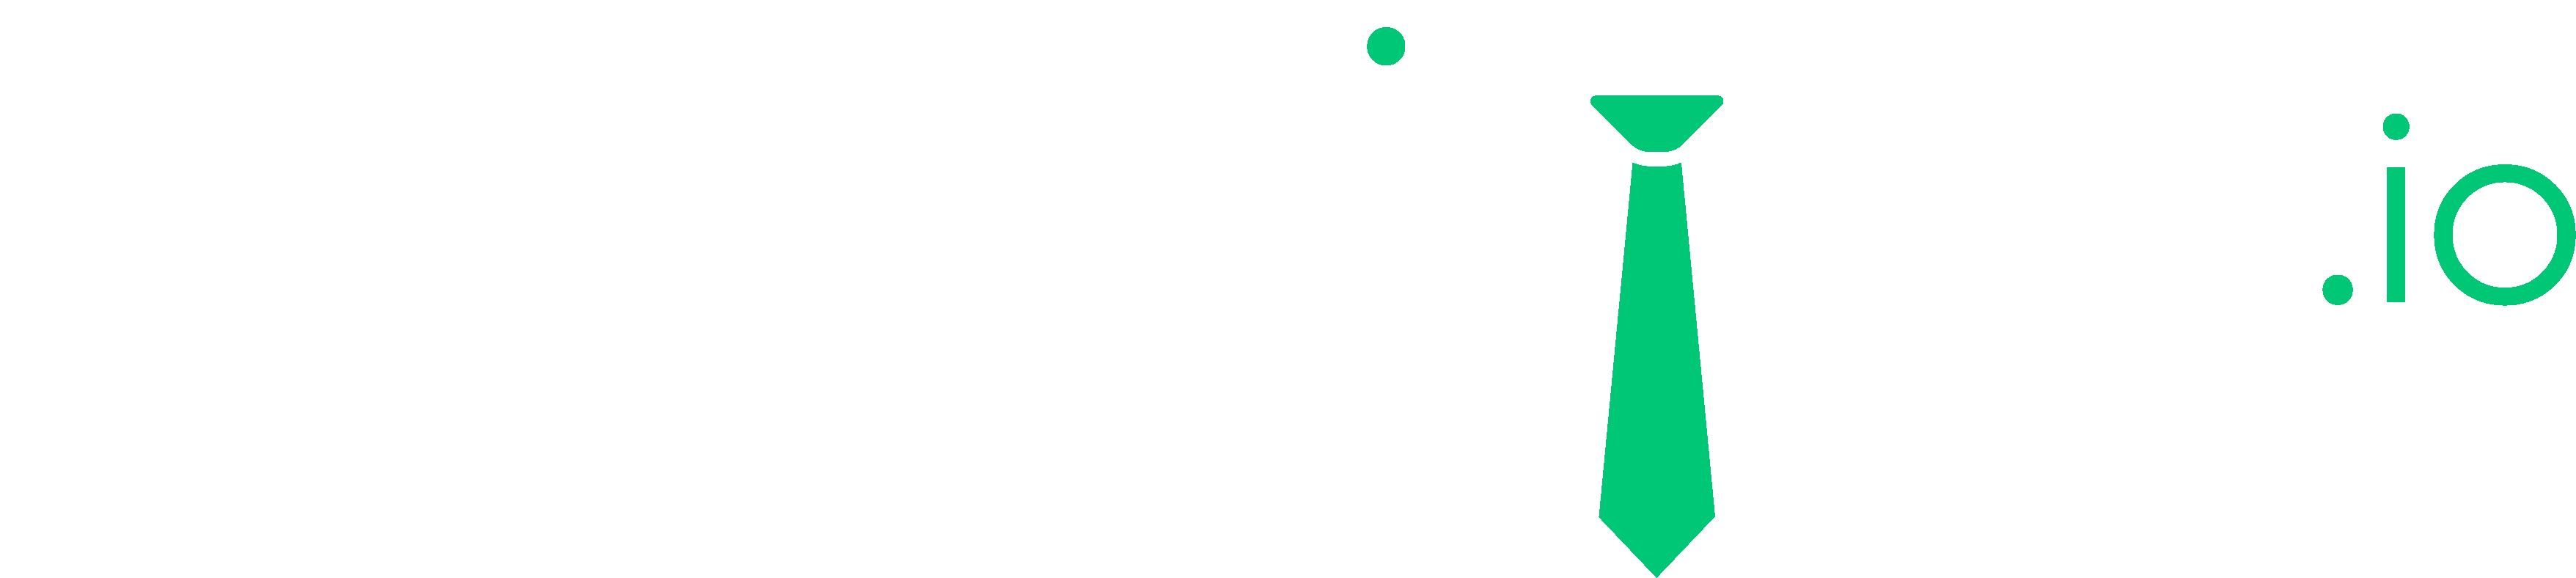 financejobs.io